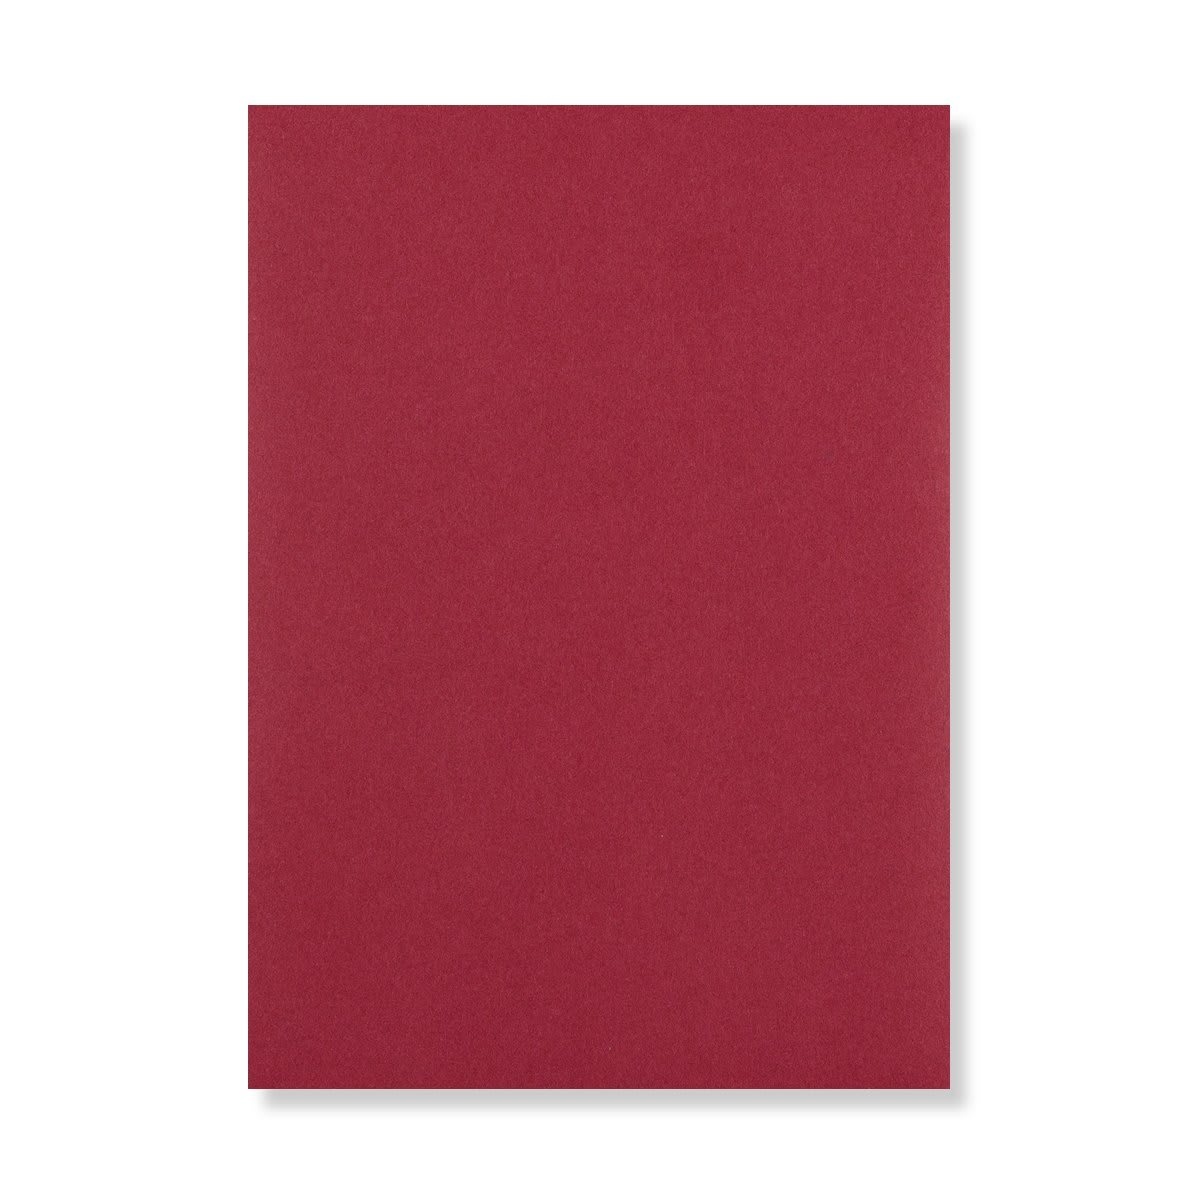 C6 RED STRING & WASHER ENVELOPES 180GSM